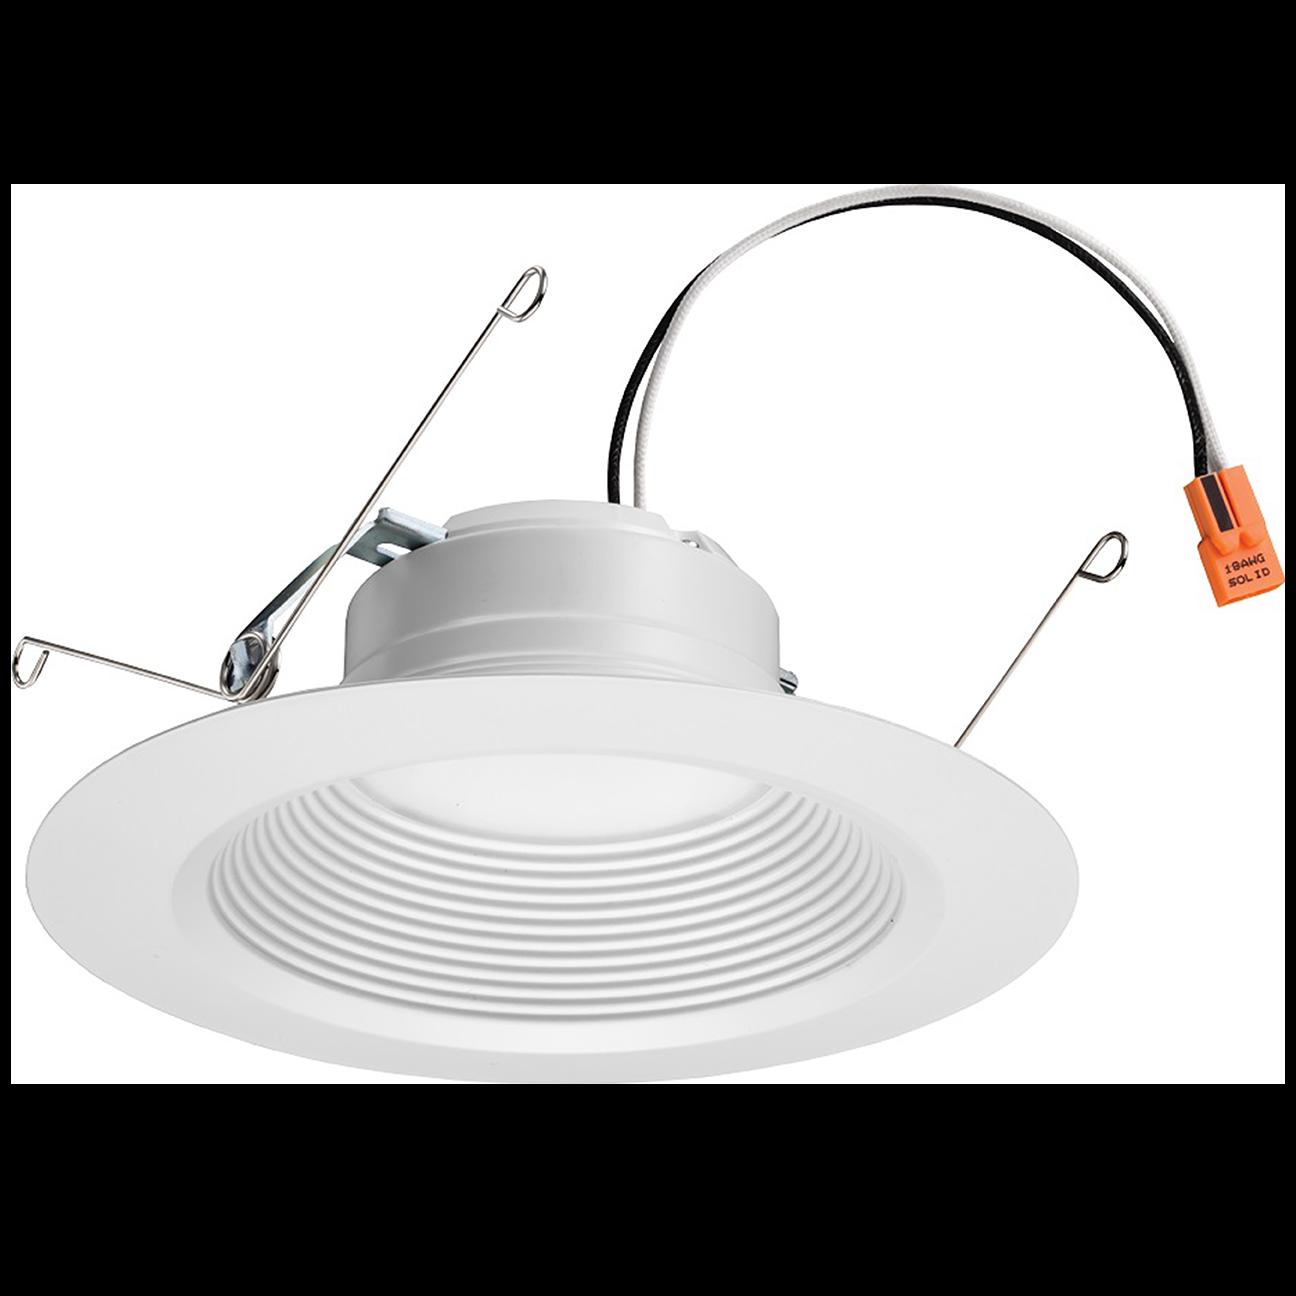 Lithonia Lighting® 65BEMWLED30K90CRIM6 LITH 65BEMW-LED-30K-90CRI-M6 Trim